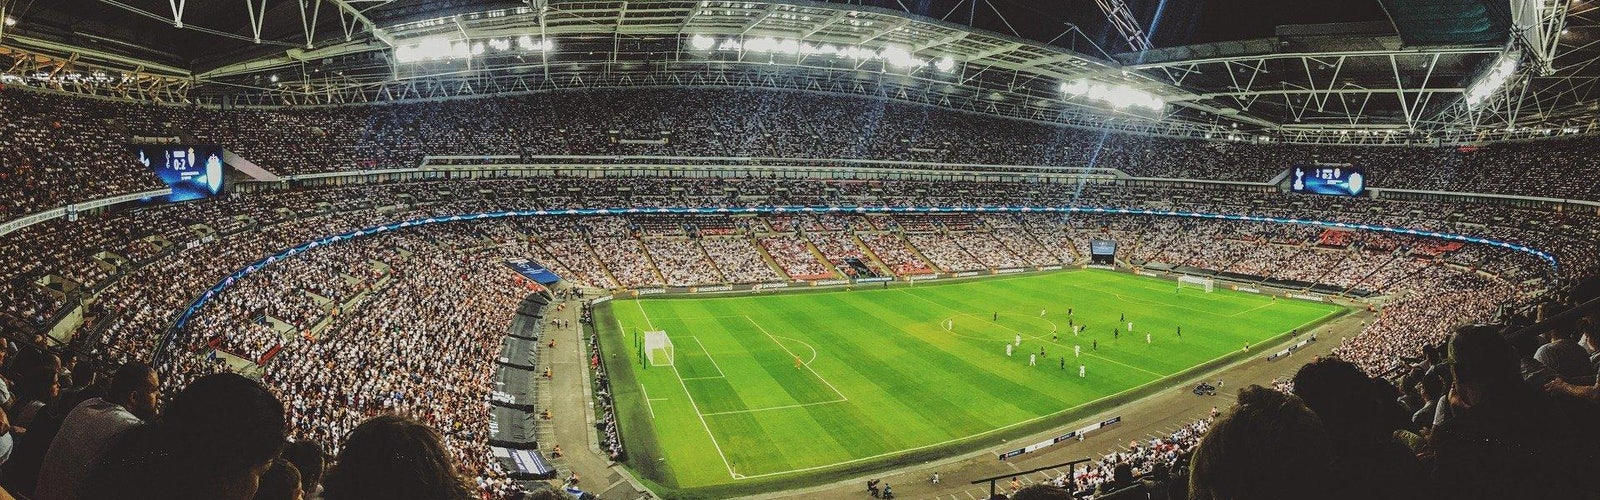 Soccer stadium UCL